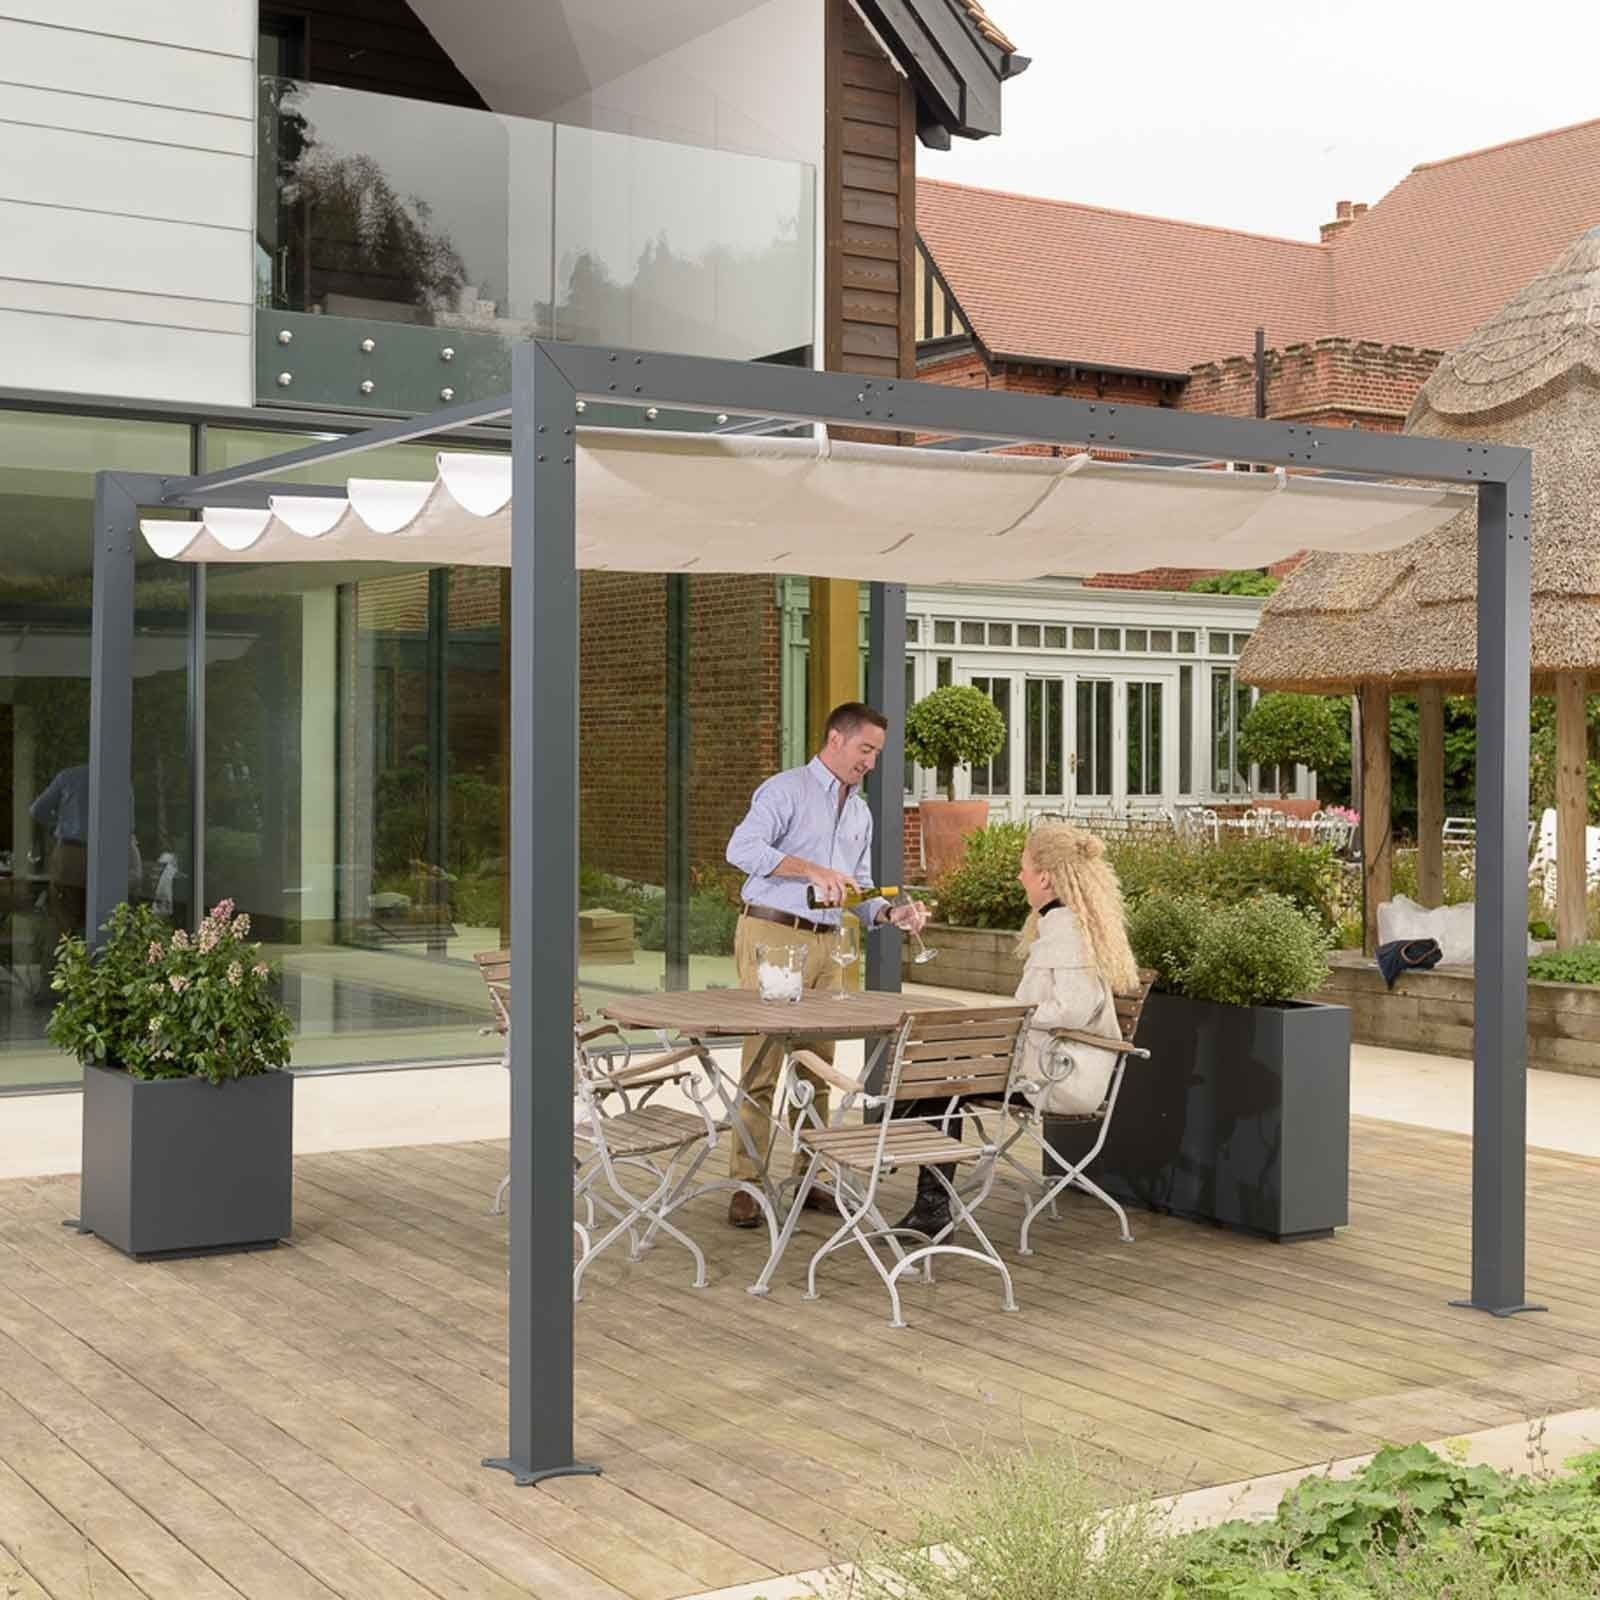 Harrod Contemporary Pergola With Retractable Awning Harrod Horticultural In 2020 Pergola Retractable Awning Pergola Patio